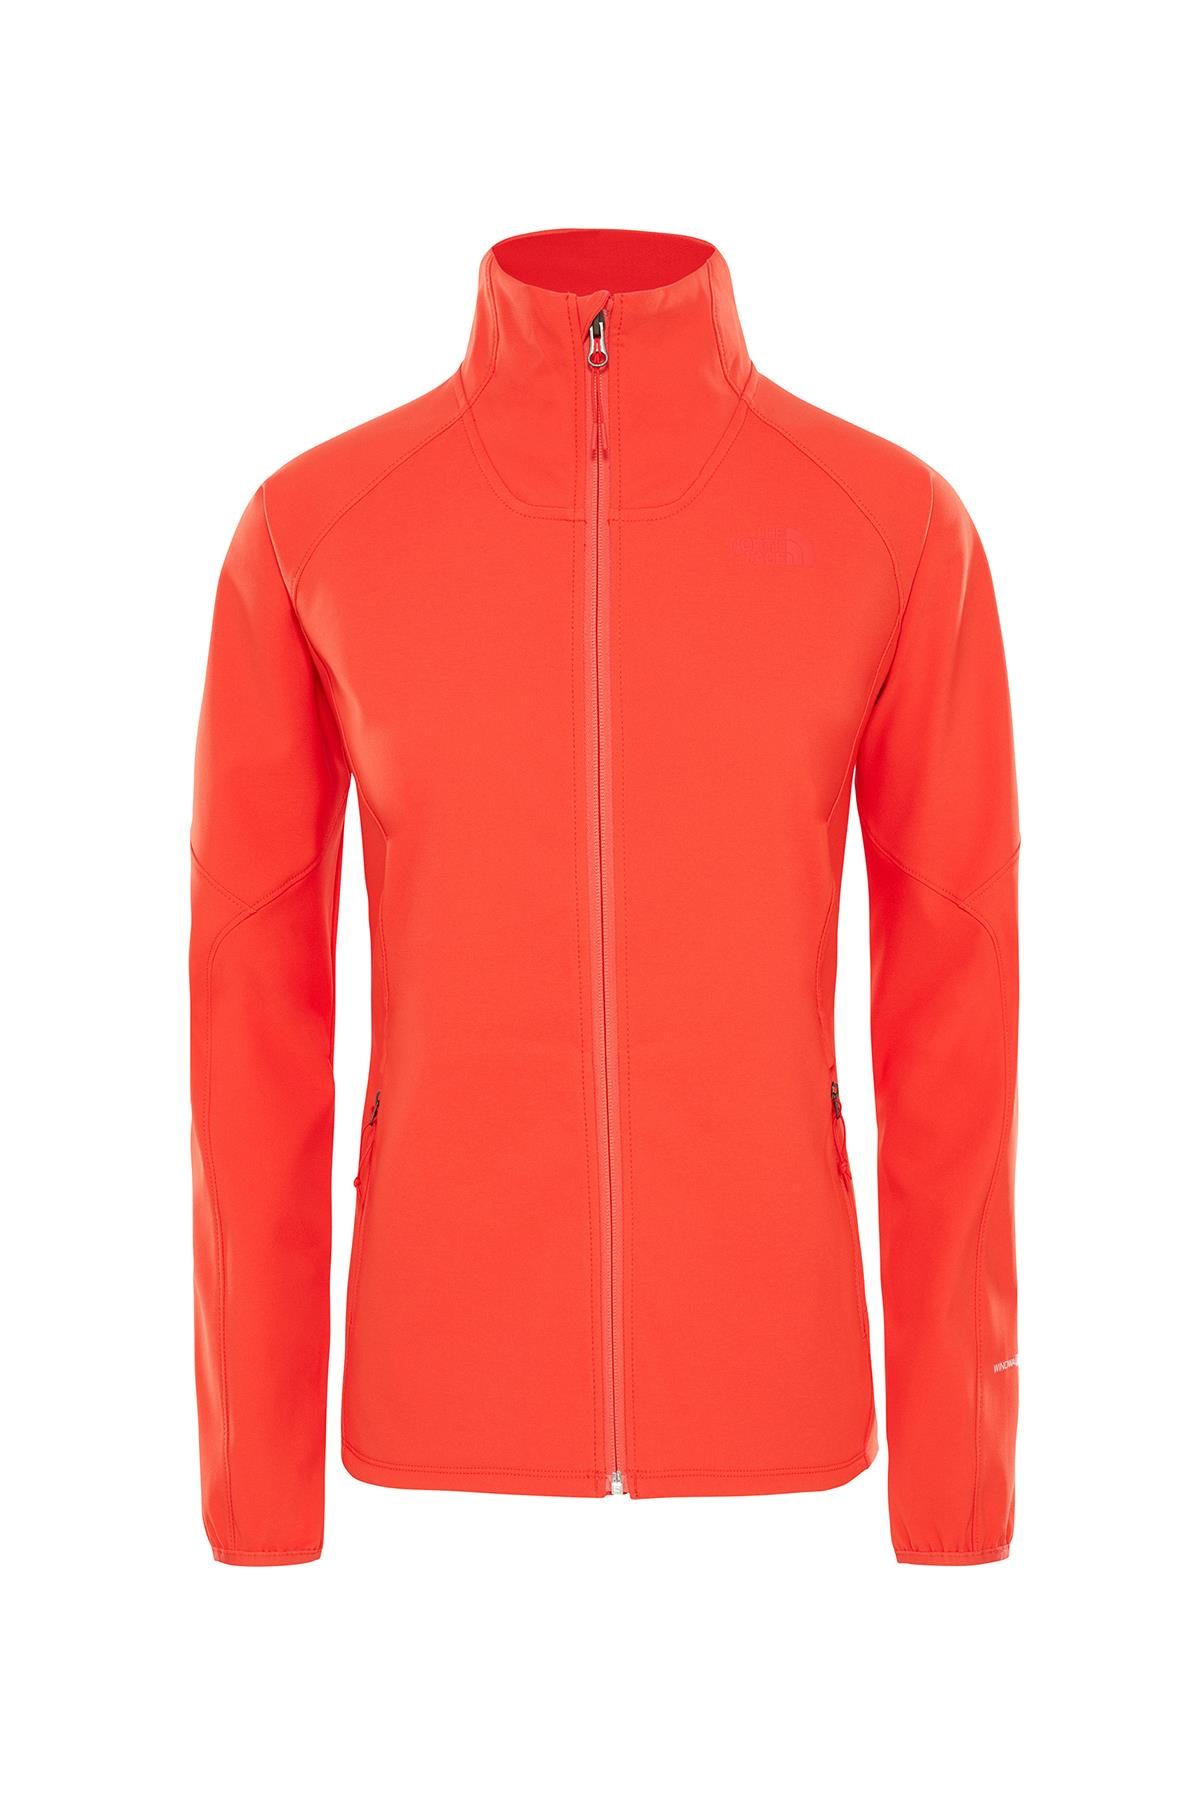 The Northface Kadın Apex Nimble Jacket T93Ocdt82 Ceket